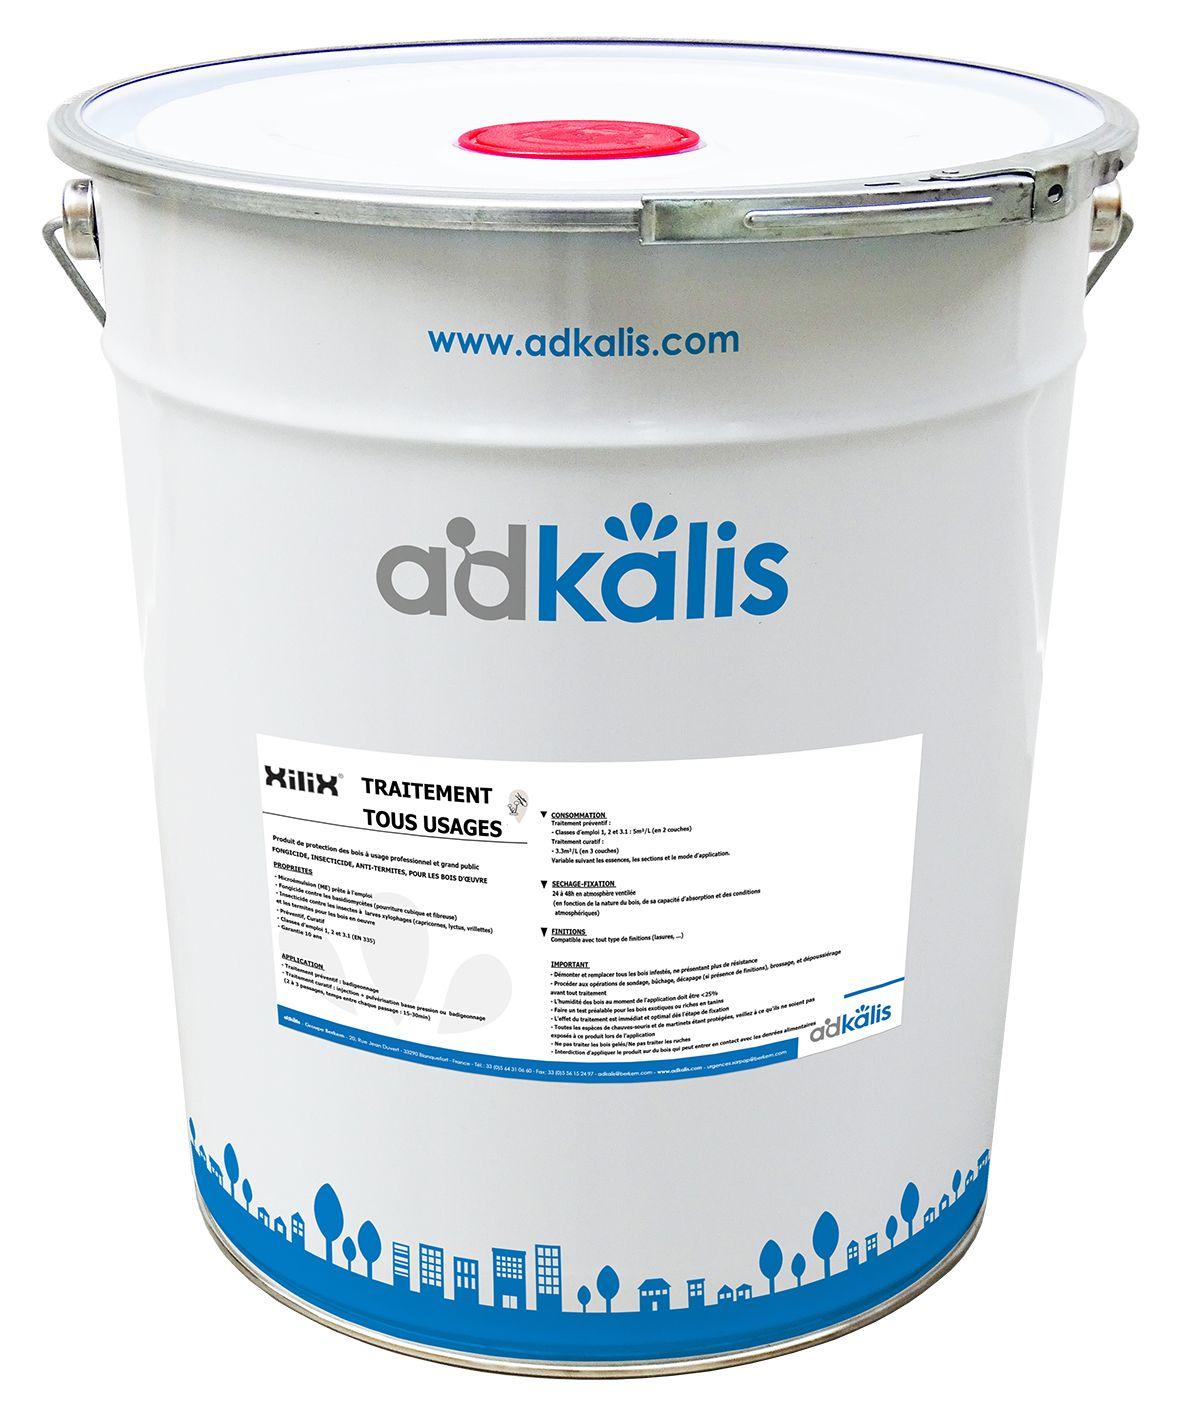 xilix-traitement-tout-usage-insecticide